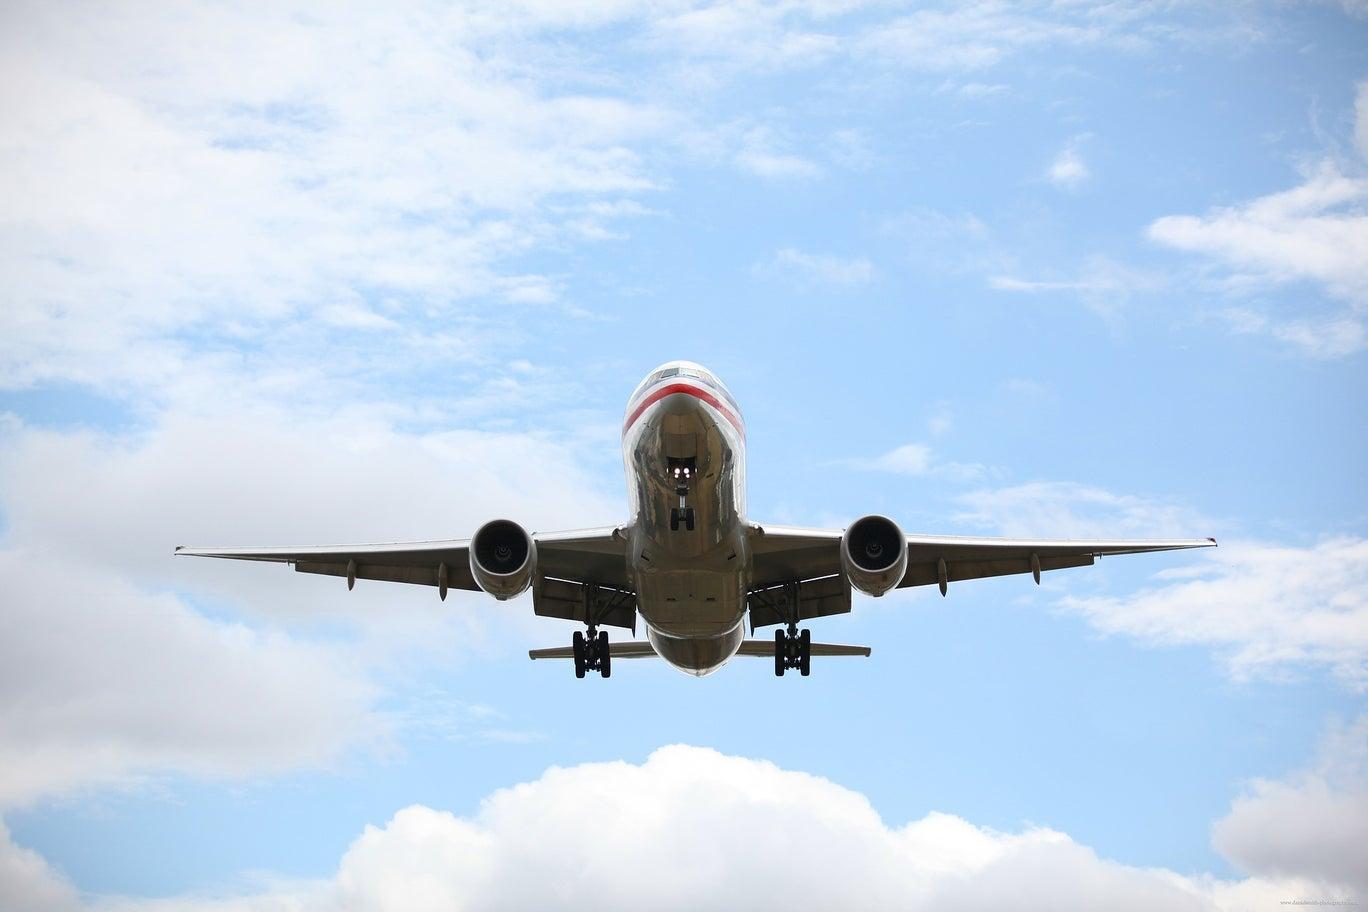 "<p>Фото © <a href=""https://www.google.com/url?sa=i&url=https://www.pickpik.com/passenger-plane-passenger-jet-airplane-landing-gear-airplane-landing-airport-118488&psig=AOvVaw2RarYv6uopKebZdd91LAjJ&ust=1594120094018000&source=images&cd=vfe&ved=0CAMQjB1qFwoTCNDuiqS-uOoCFQAAAAAdAAAAABAJ"" target=""_blank"" rel=""noopener noreferrer"">PickPik</a></p>"